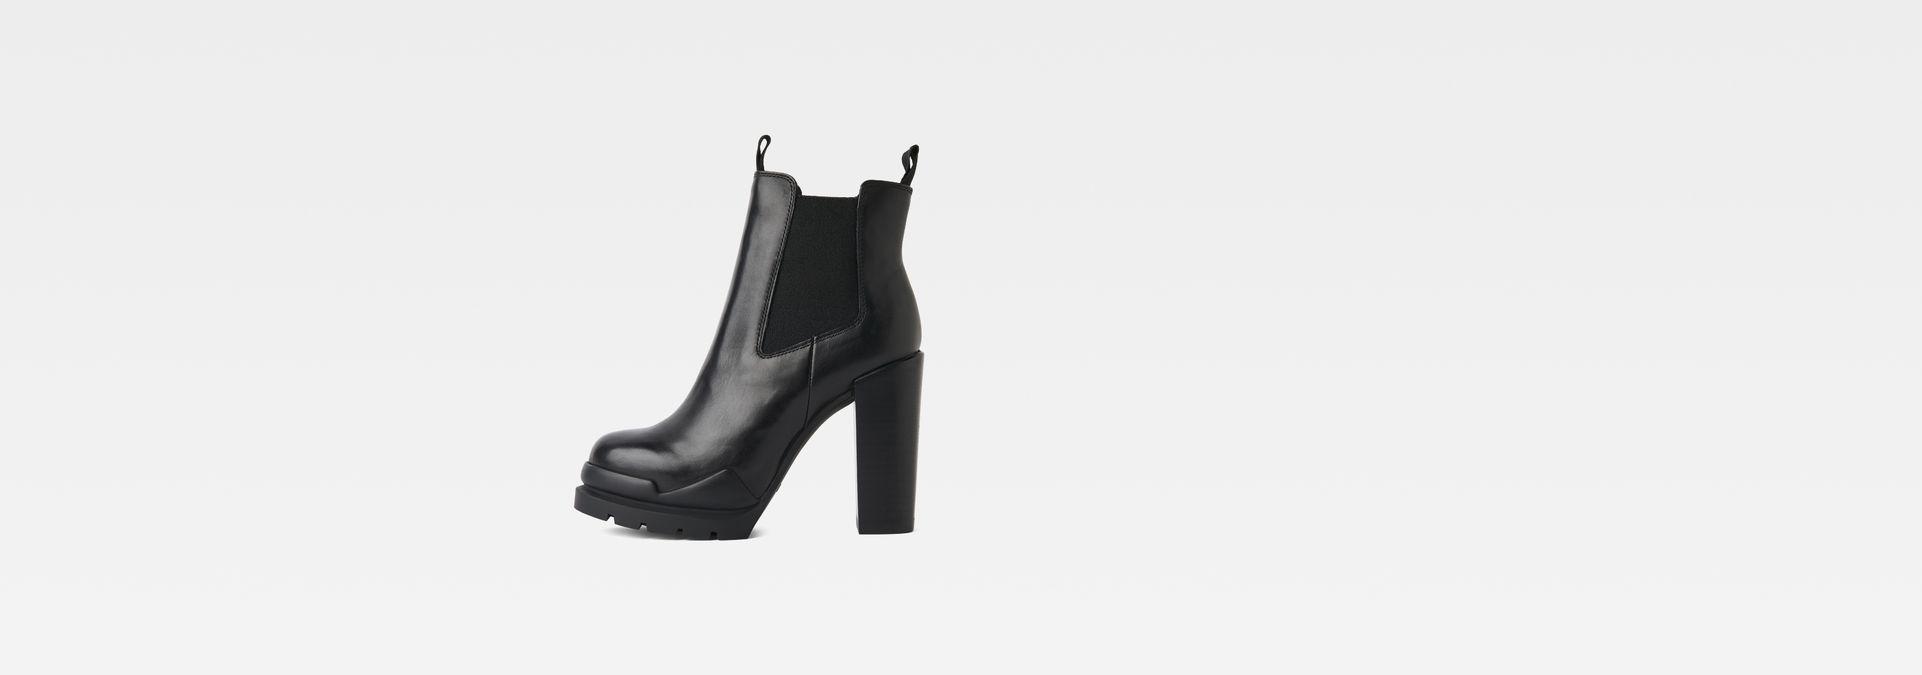 Rackam Heel Chelsea Boot | Black | Femmes | G Star RAW®